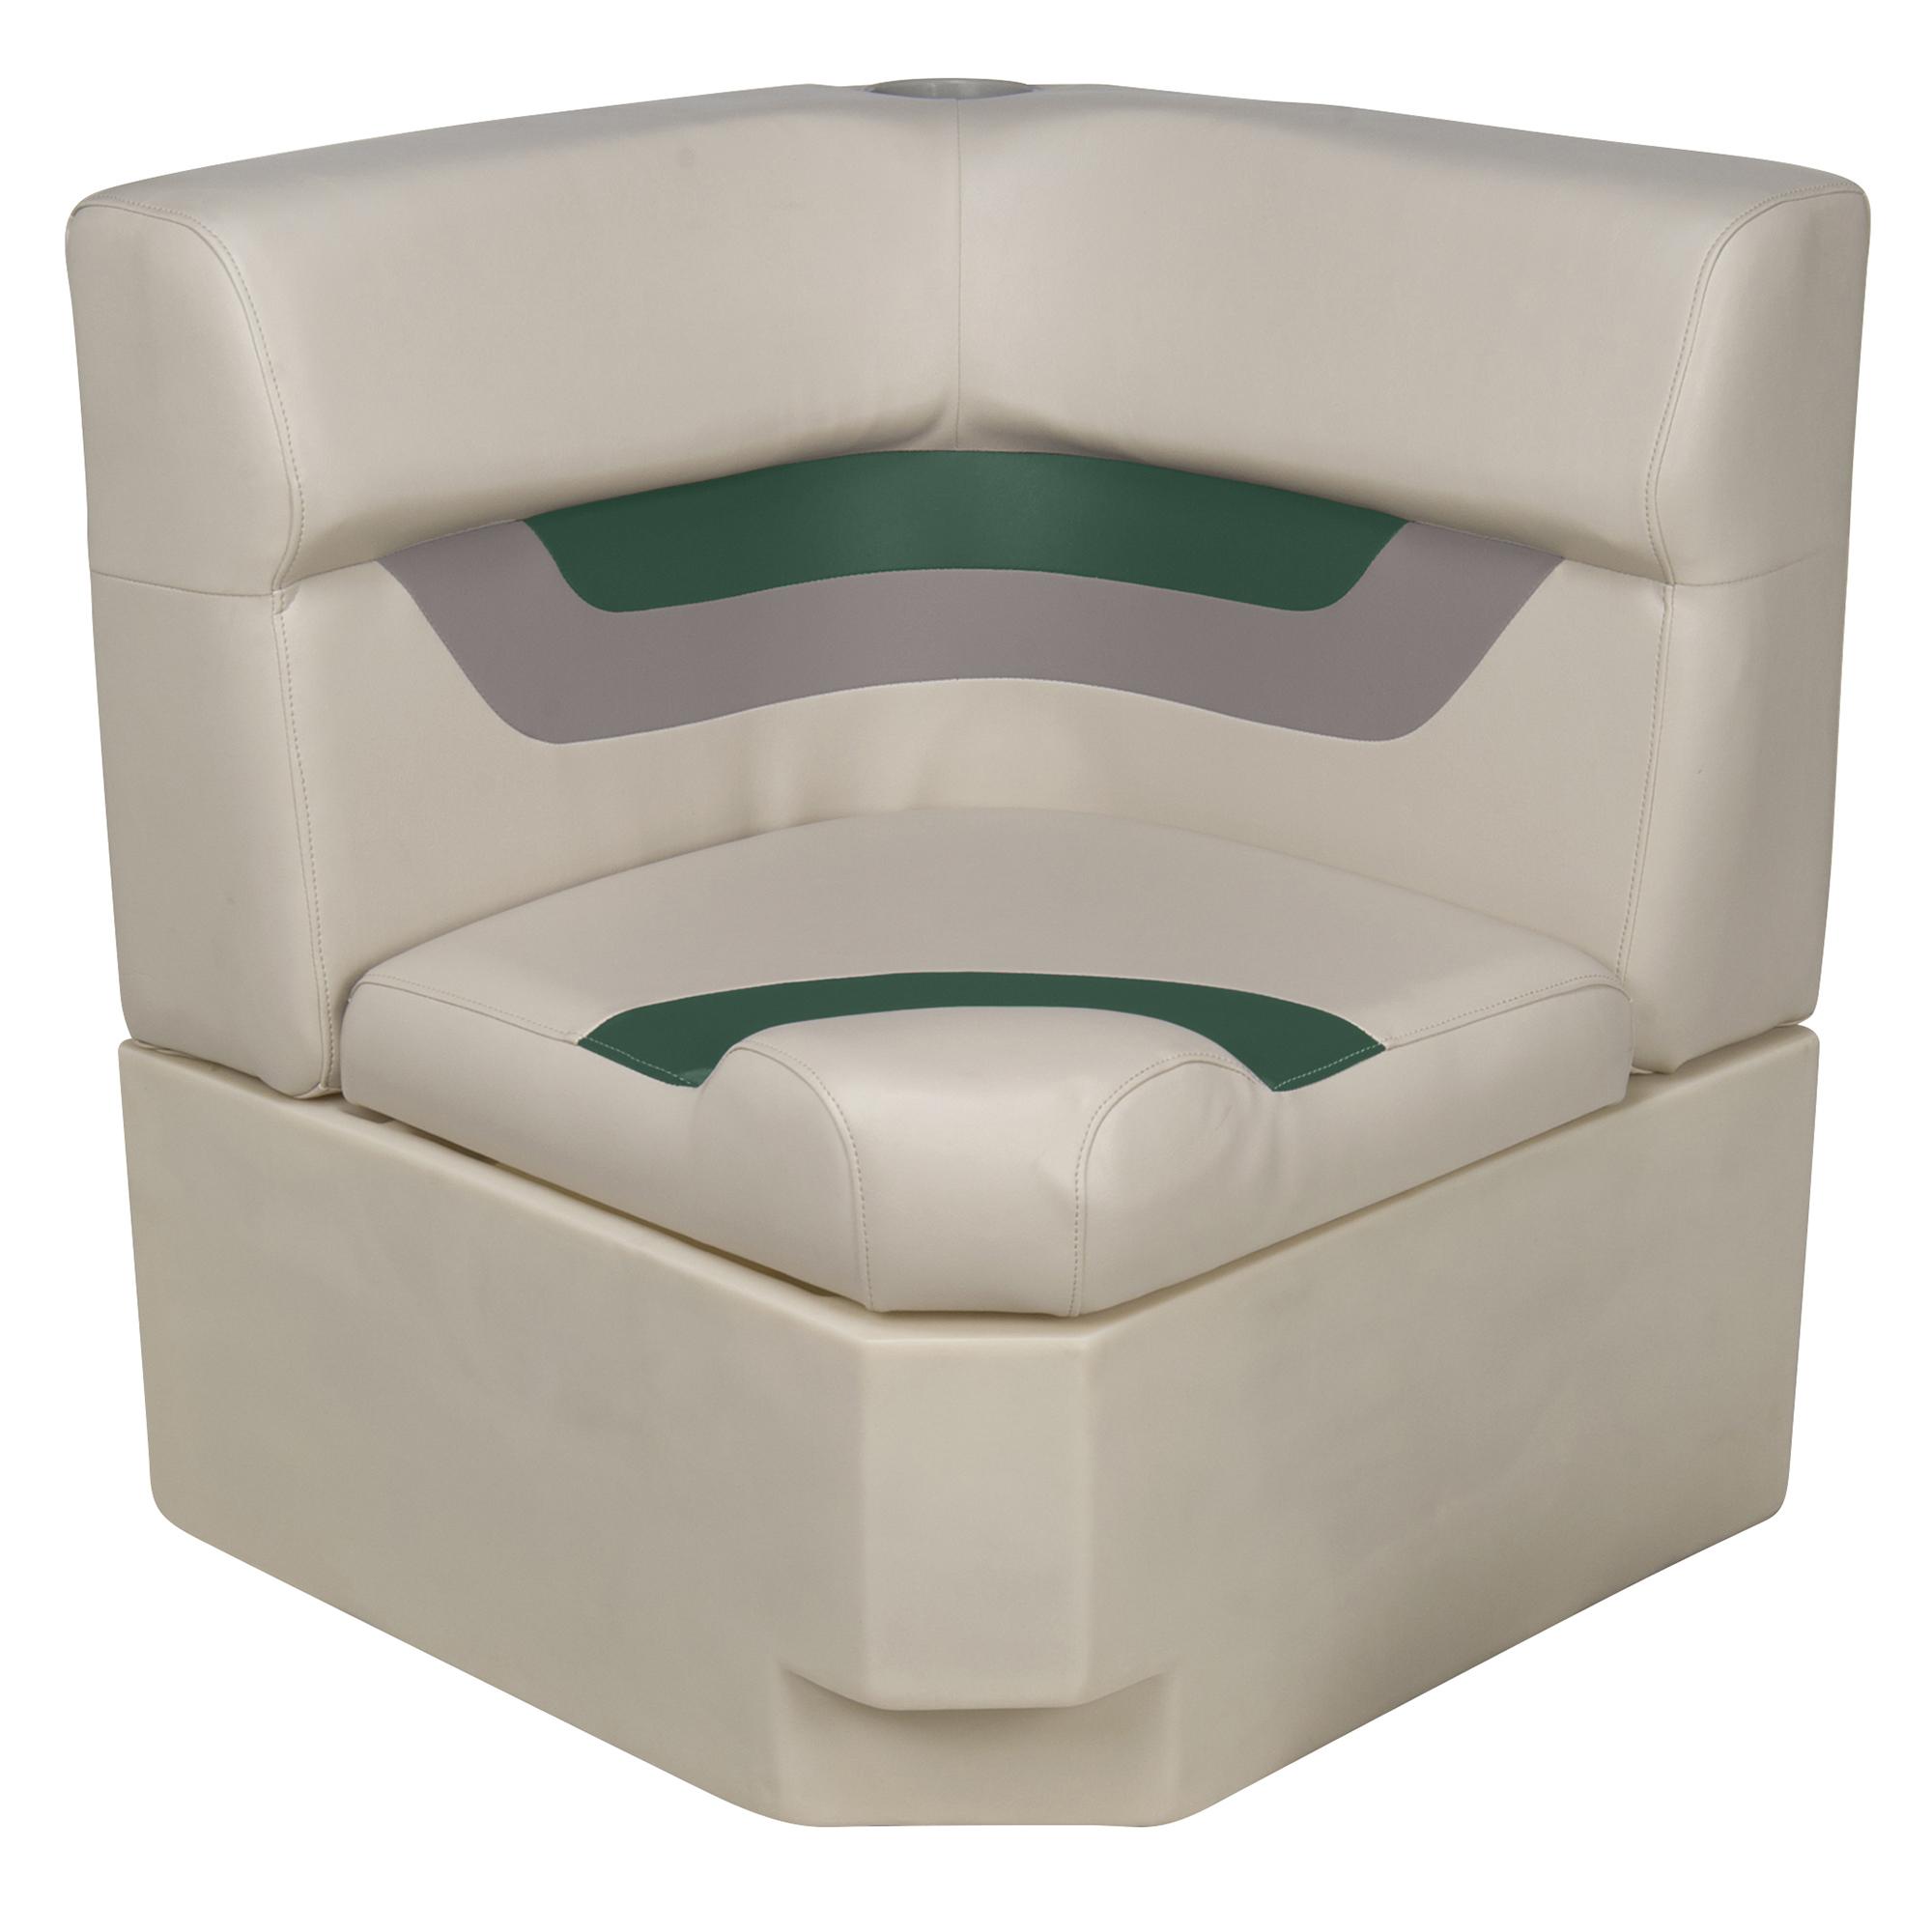 Toonmate Designer Pontoon Corner Section Seat, Platinum